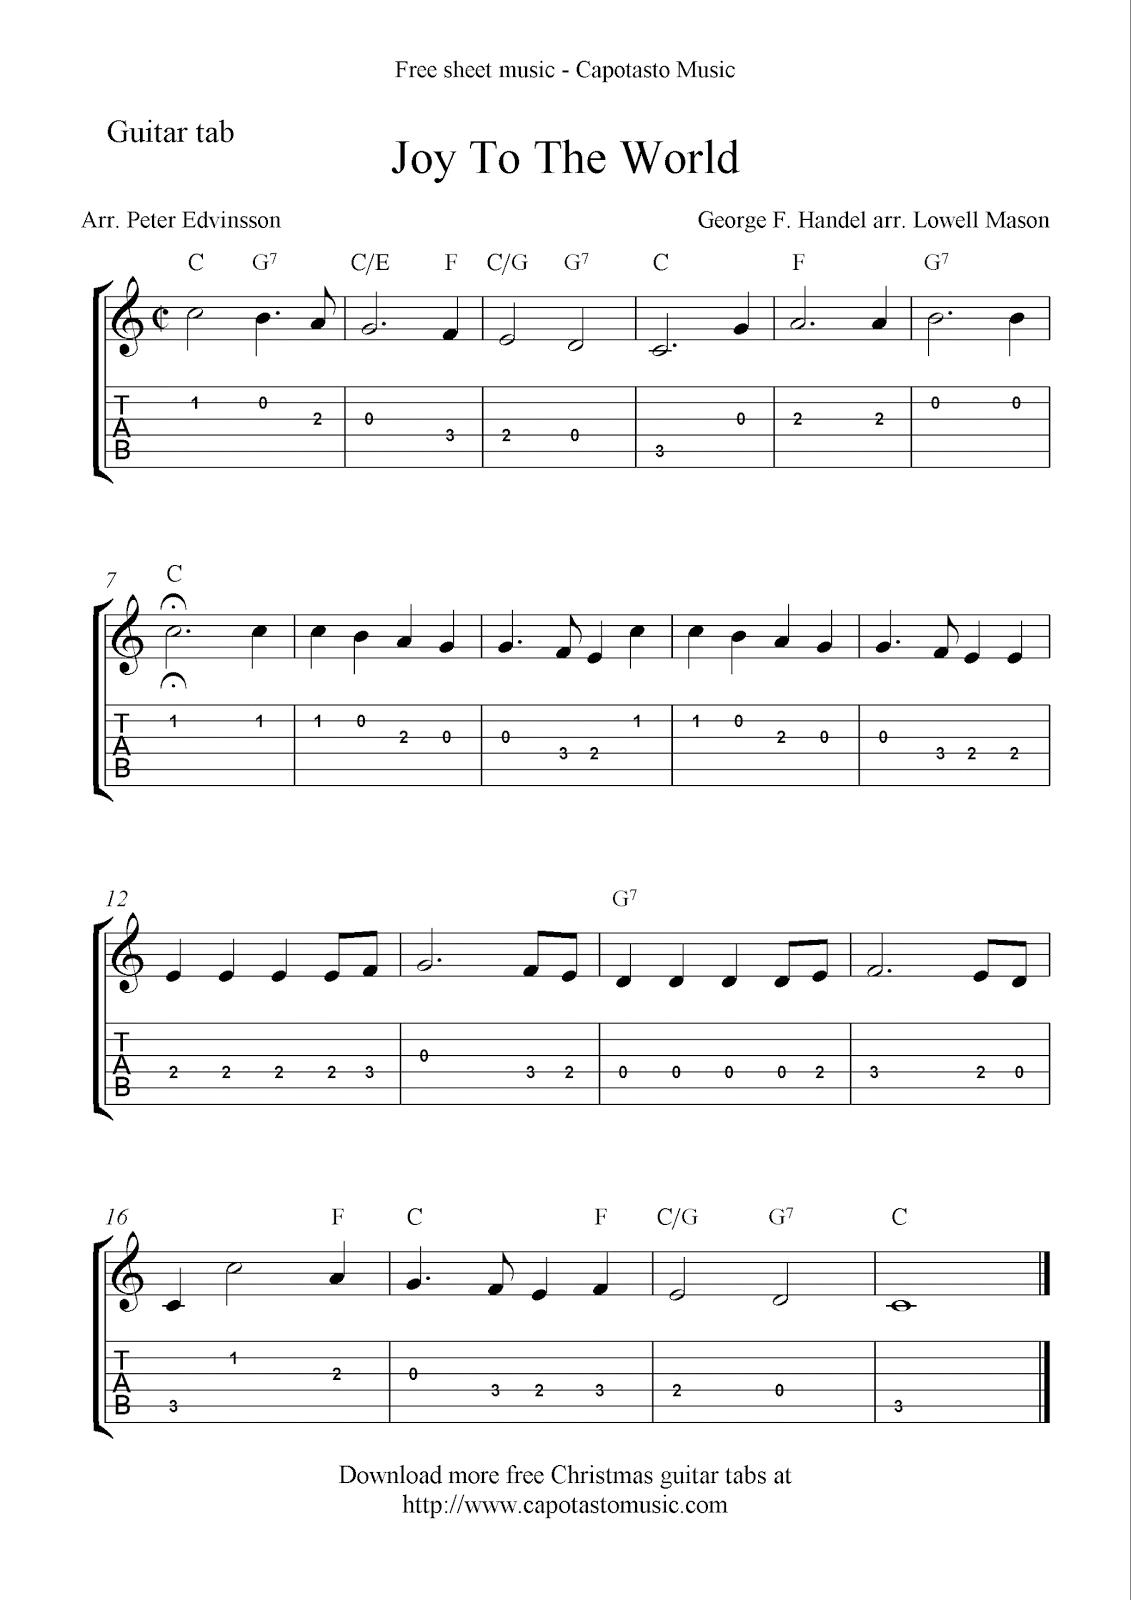 Free Printable Sheet Music: Joy To The World, Free Christmas Guitar - Free Printable Guitar Tabs For Beginners